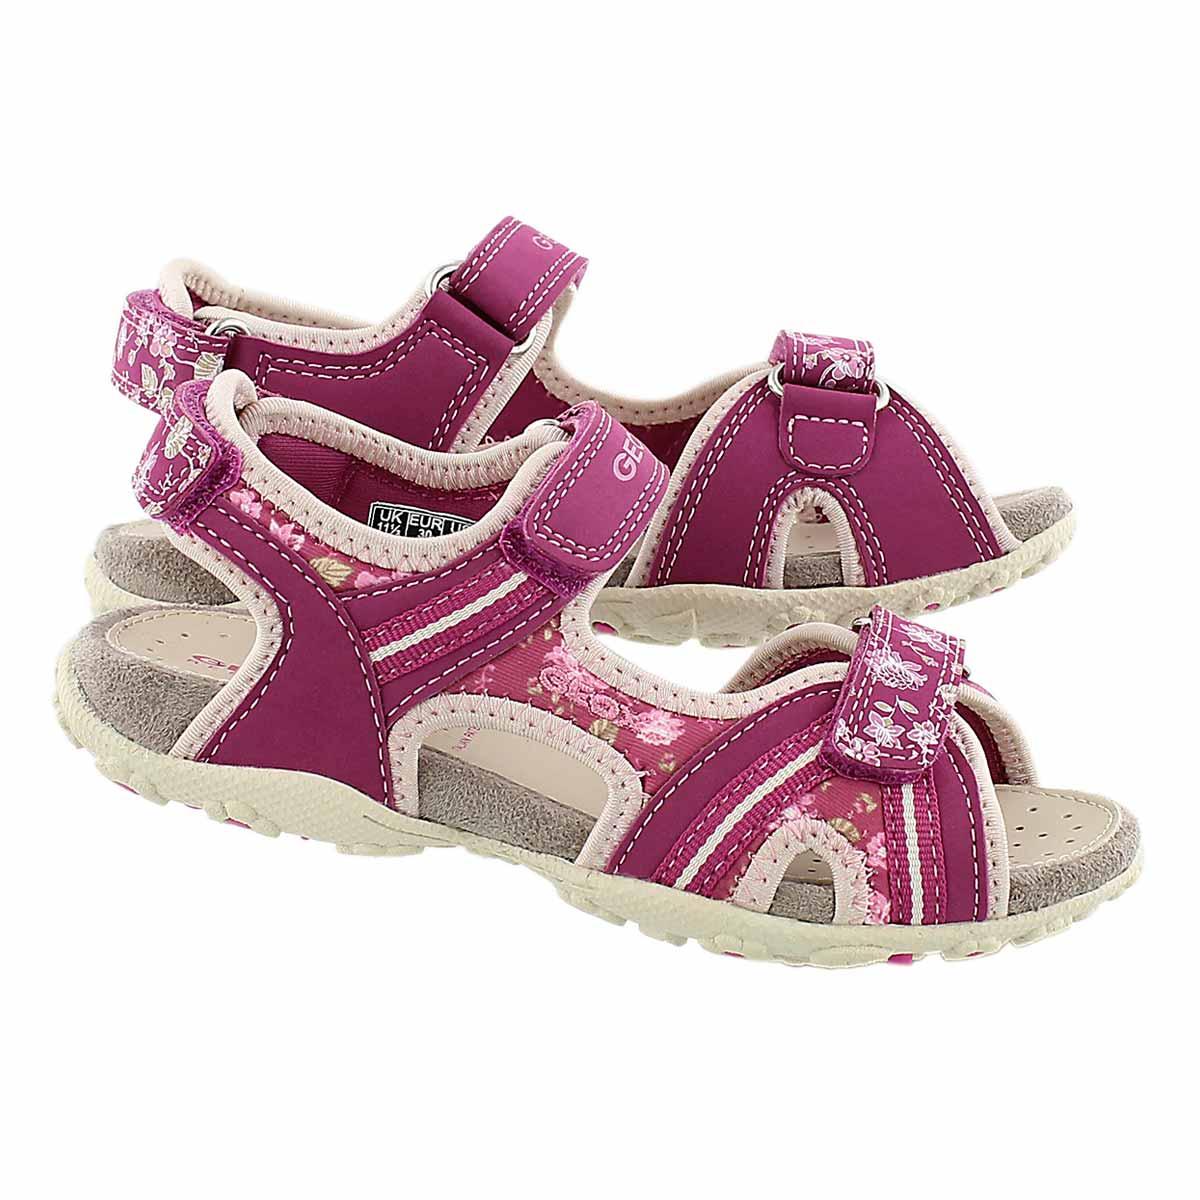 Grls Roxanne fuchsia sport sandal